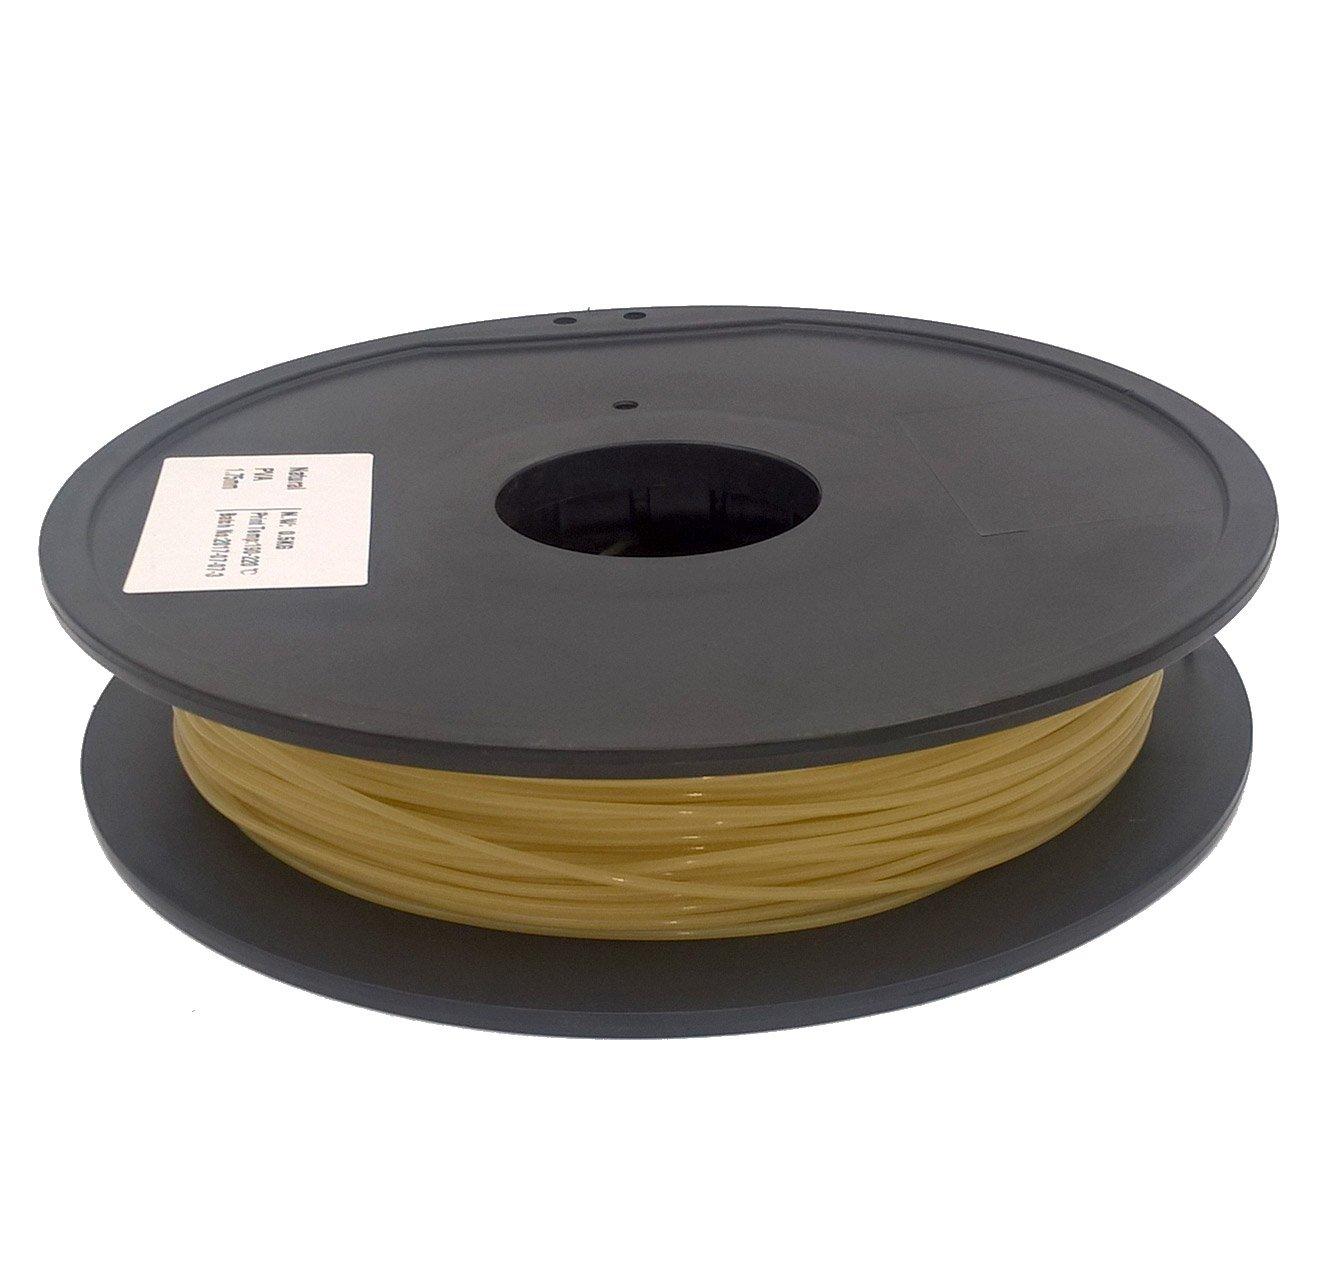 Filament PVA 1.75mm 0.5kg Impression 3D SOLUBLE